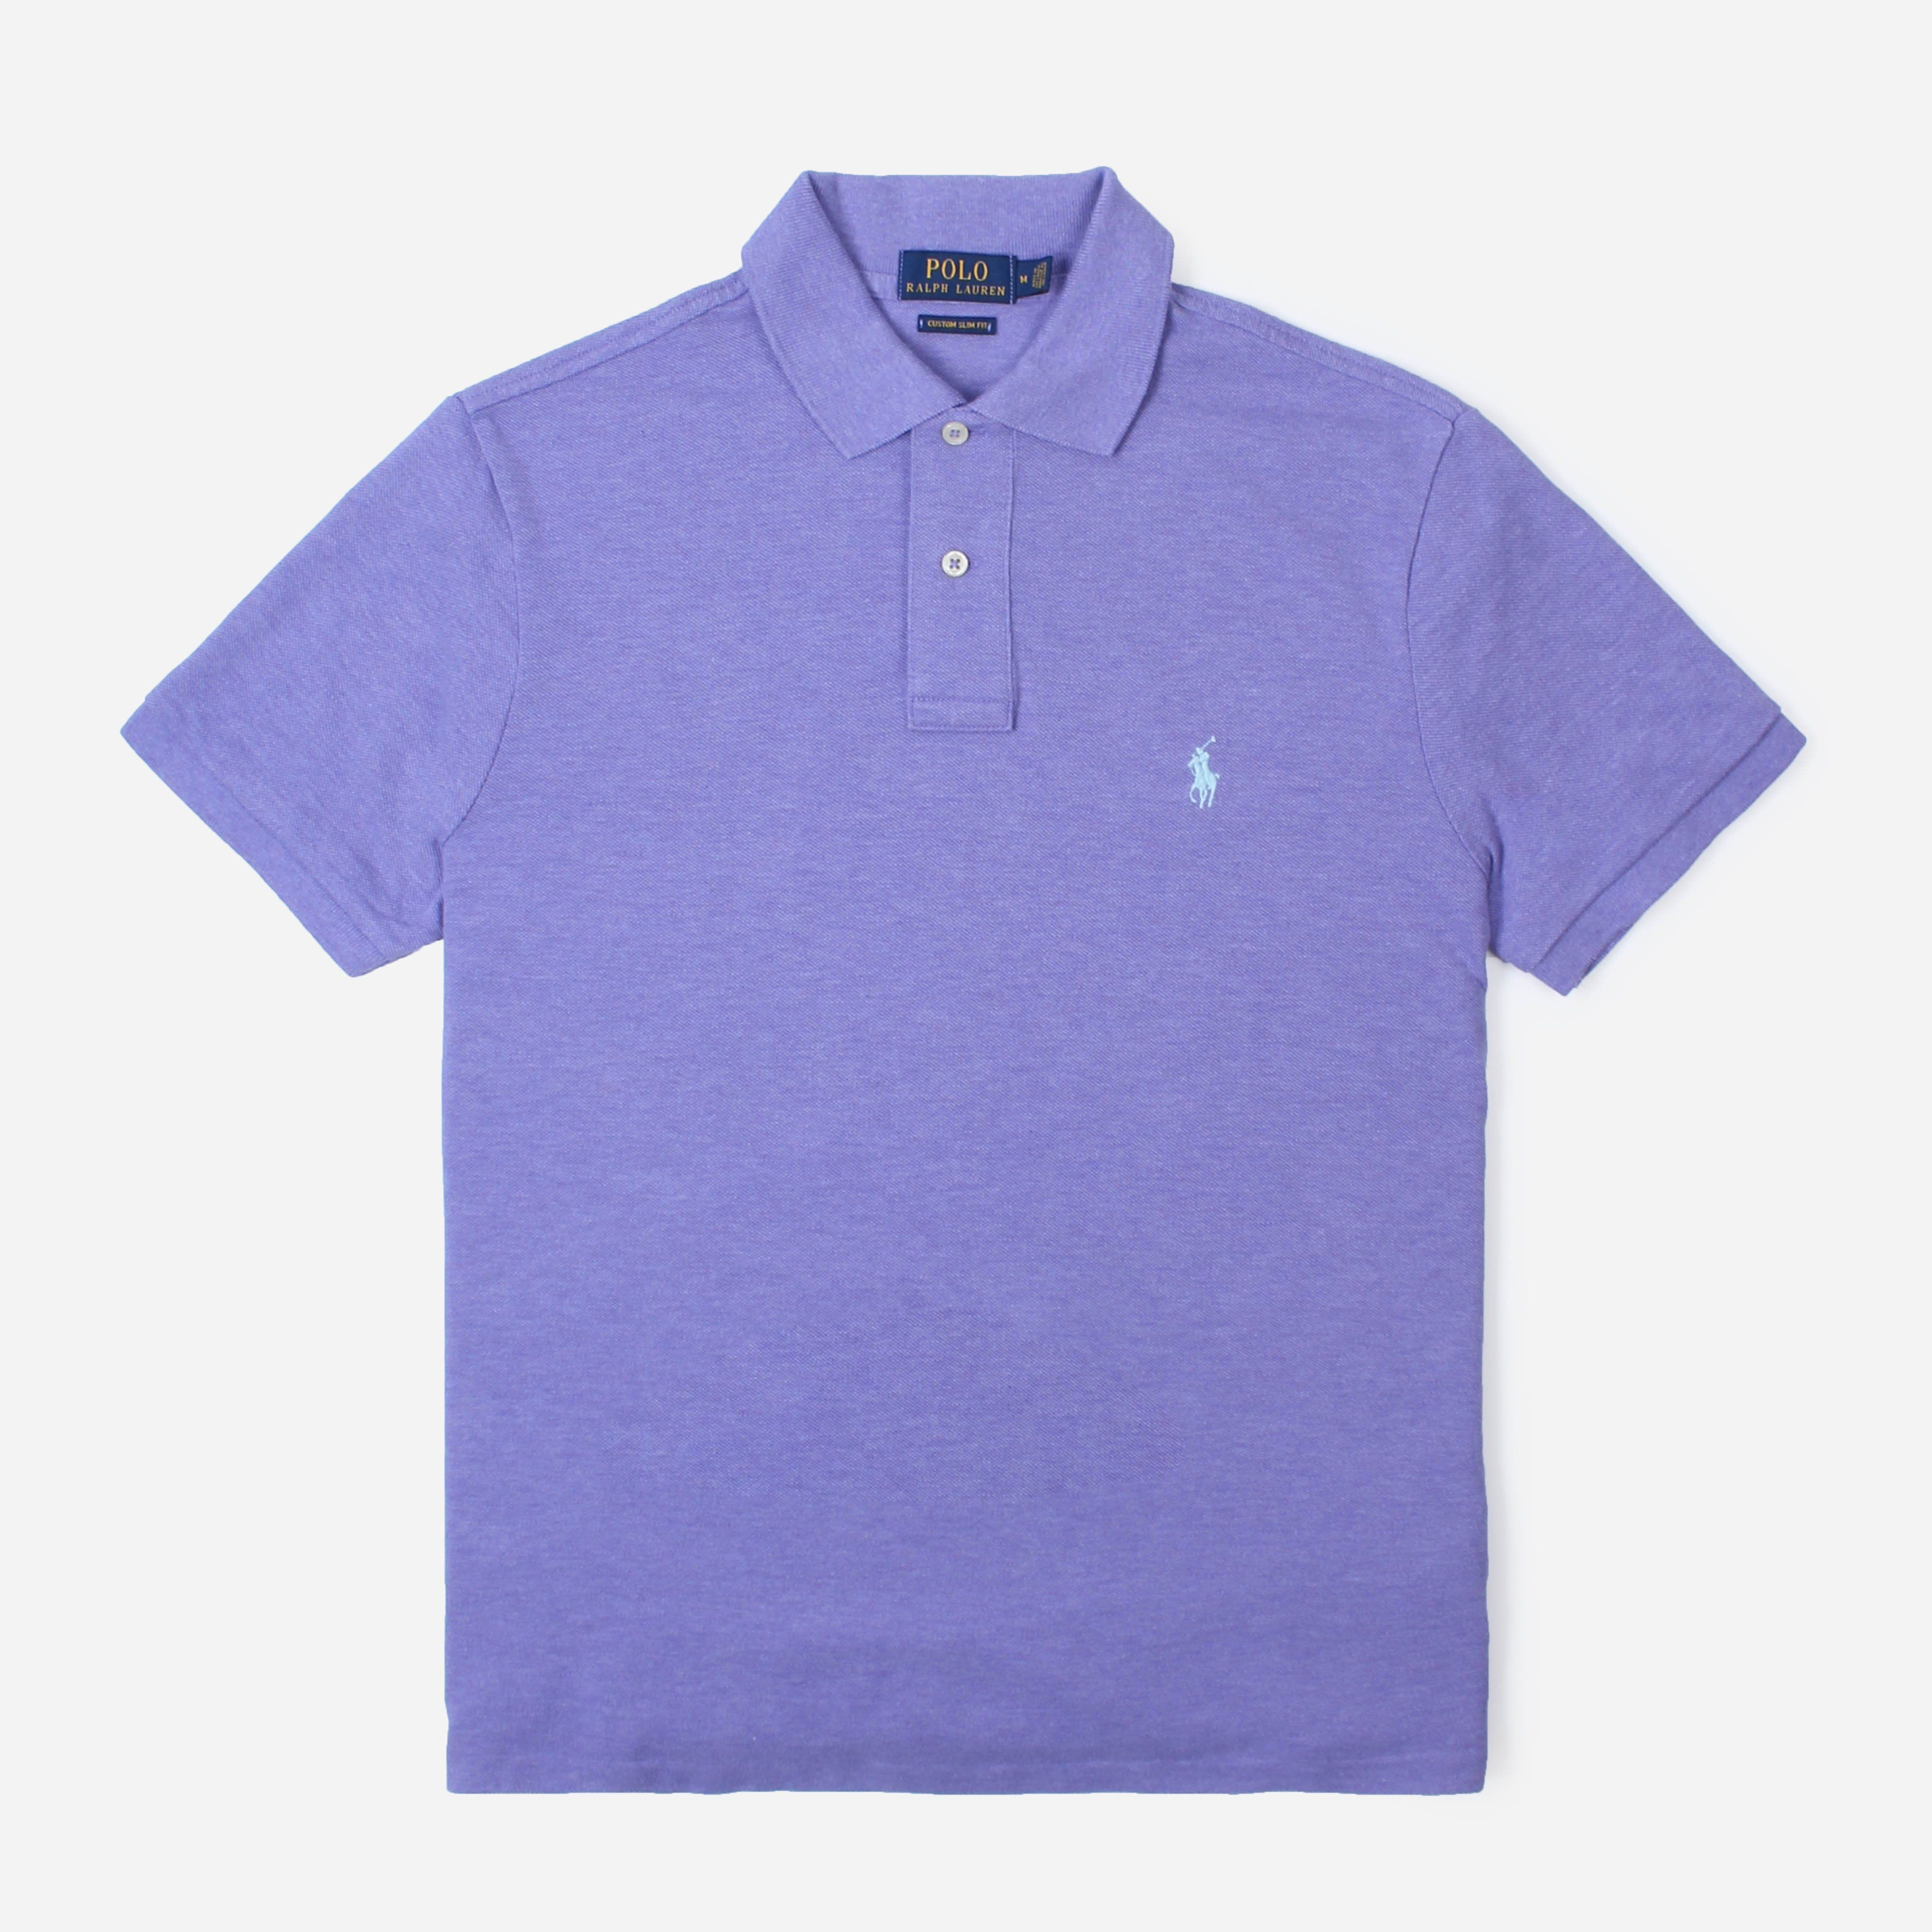 Polo Ralph Lauren Basic Mesh Polo Shirt